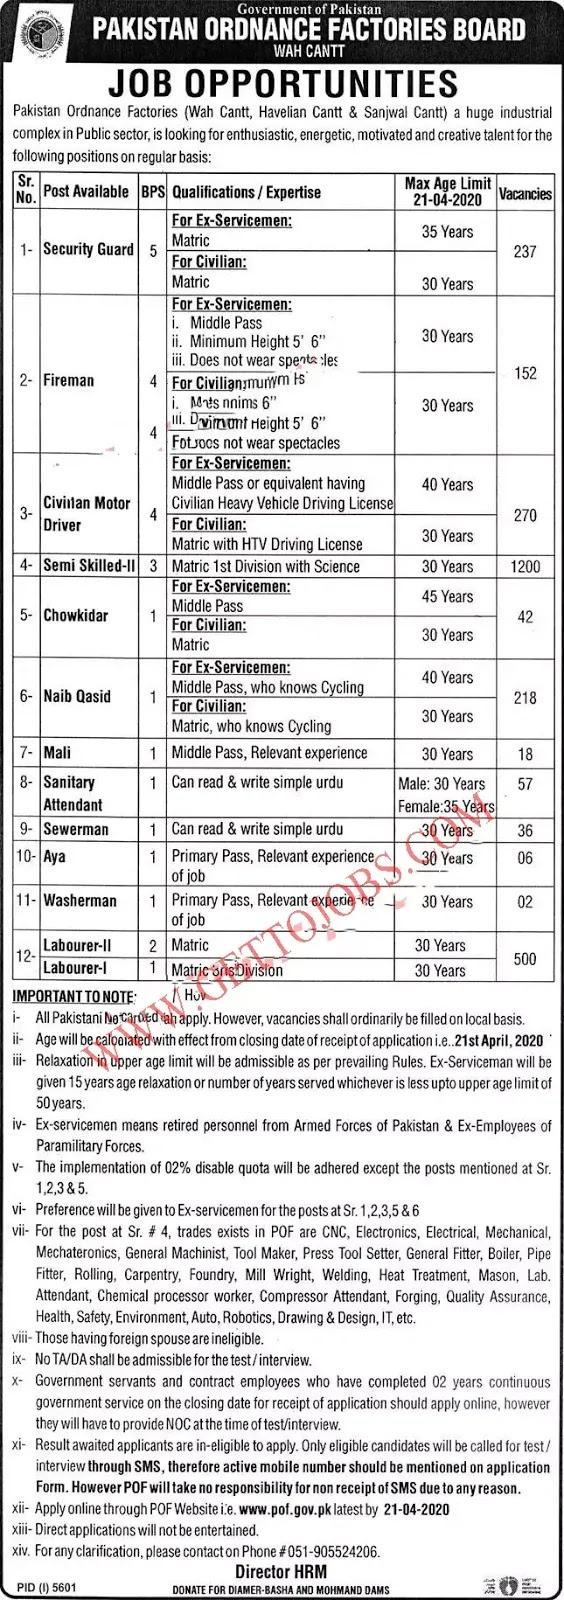 PAKISTAN ORDNANCE FACTORIES (POF) JOBS 2020